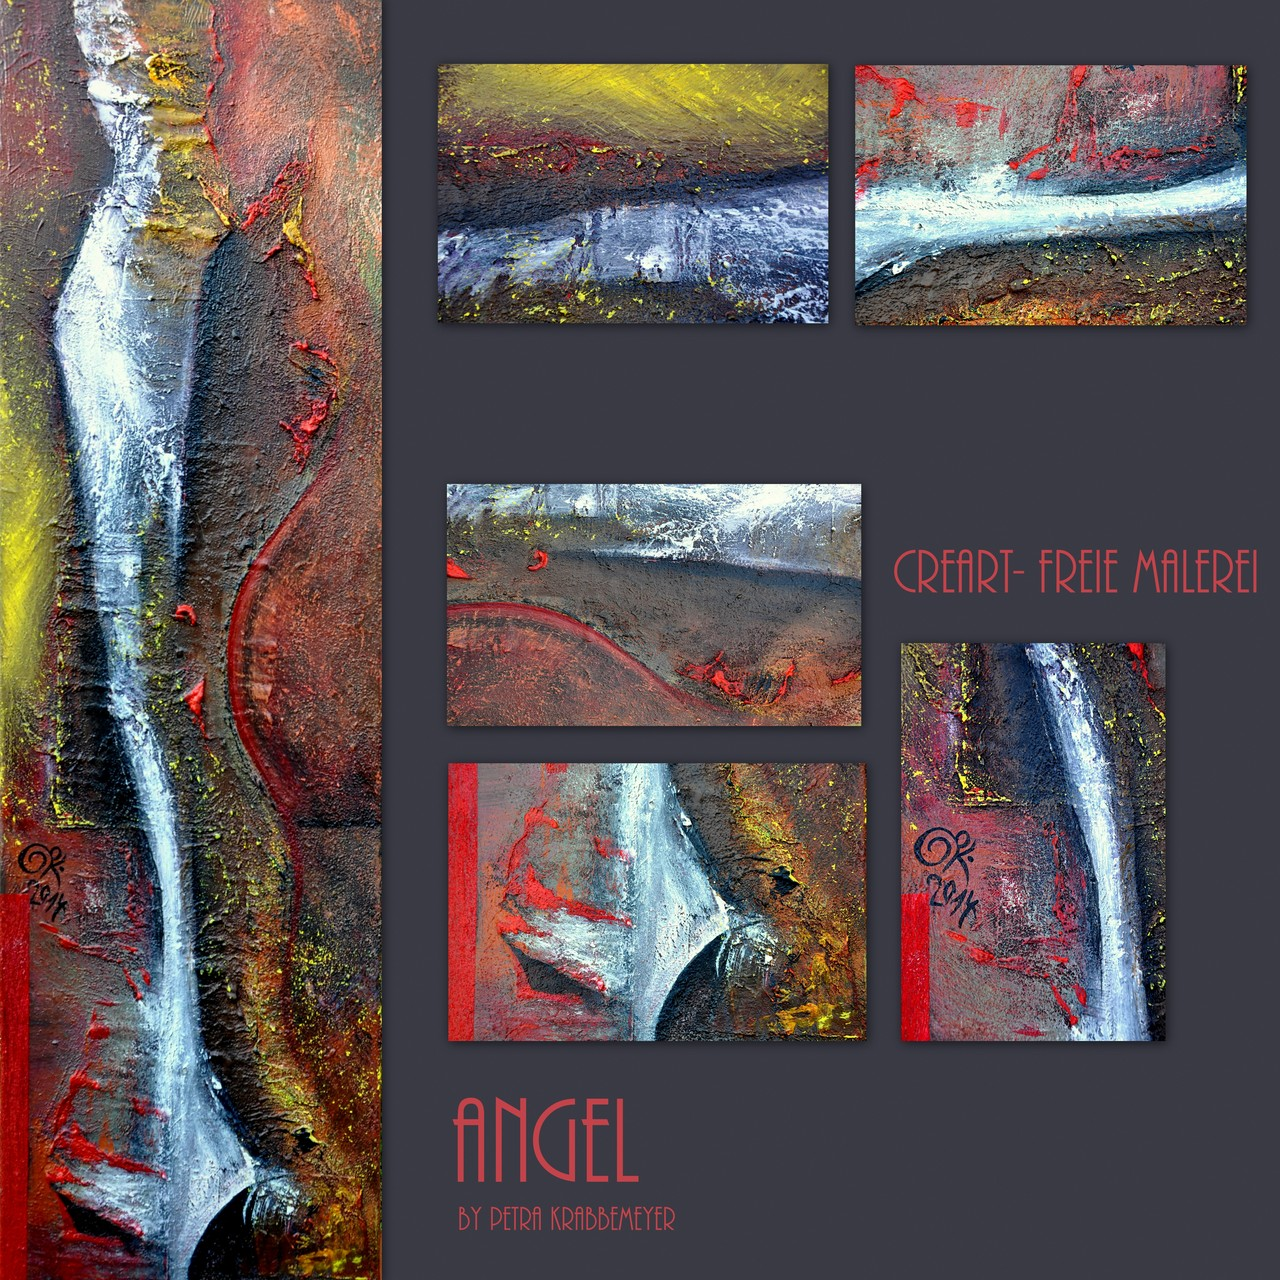 ANGEL/ Acryl auf Leinwand/ 40x100